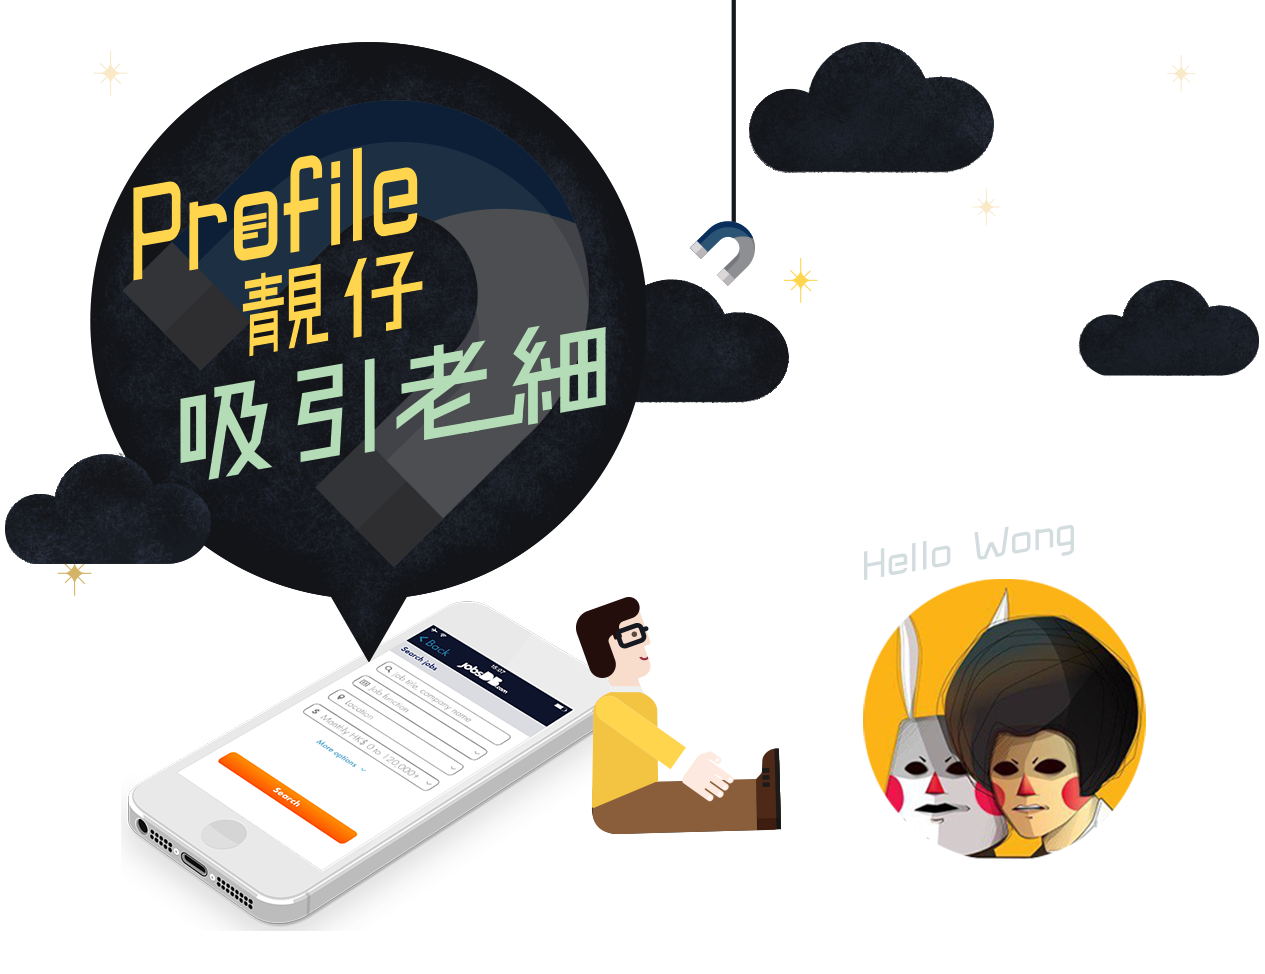 profile靚仔, 吸引老細  - Hello Wong